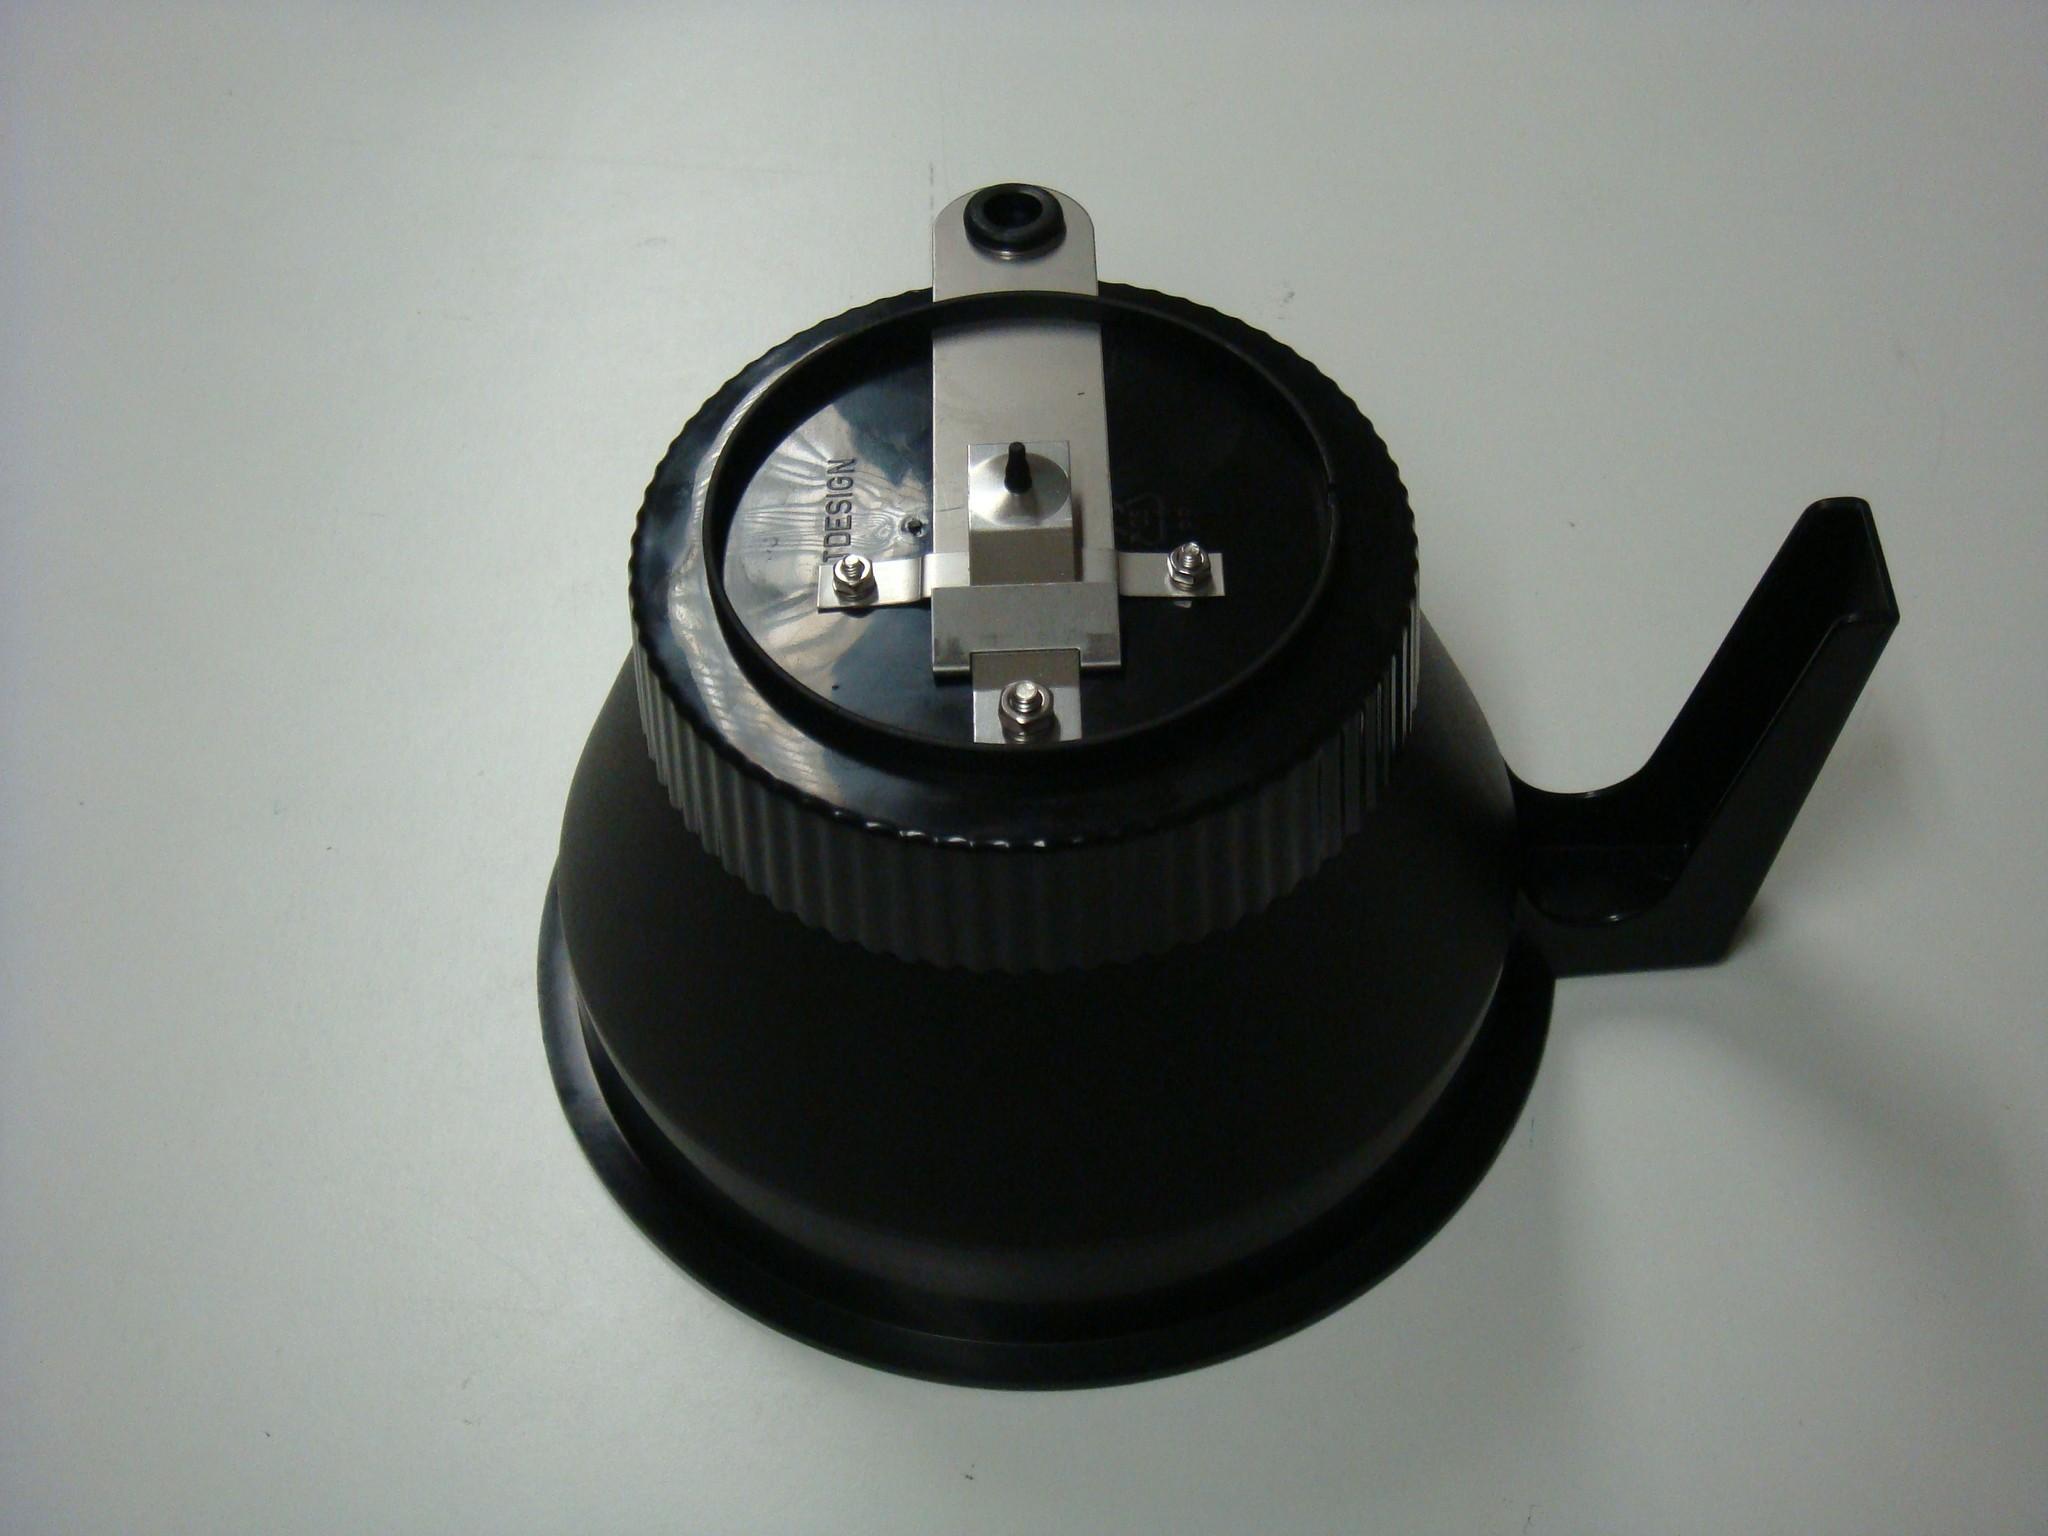 13273 moccamaster filter holder cd grand for Moccamaster spray arm